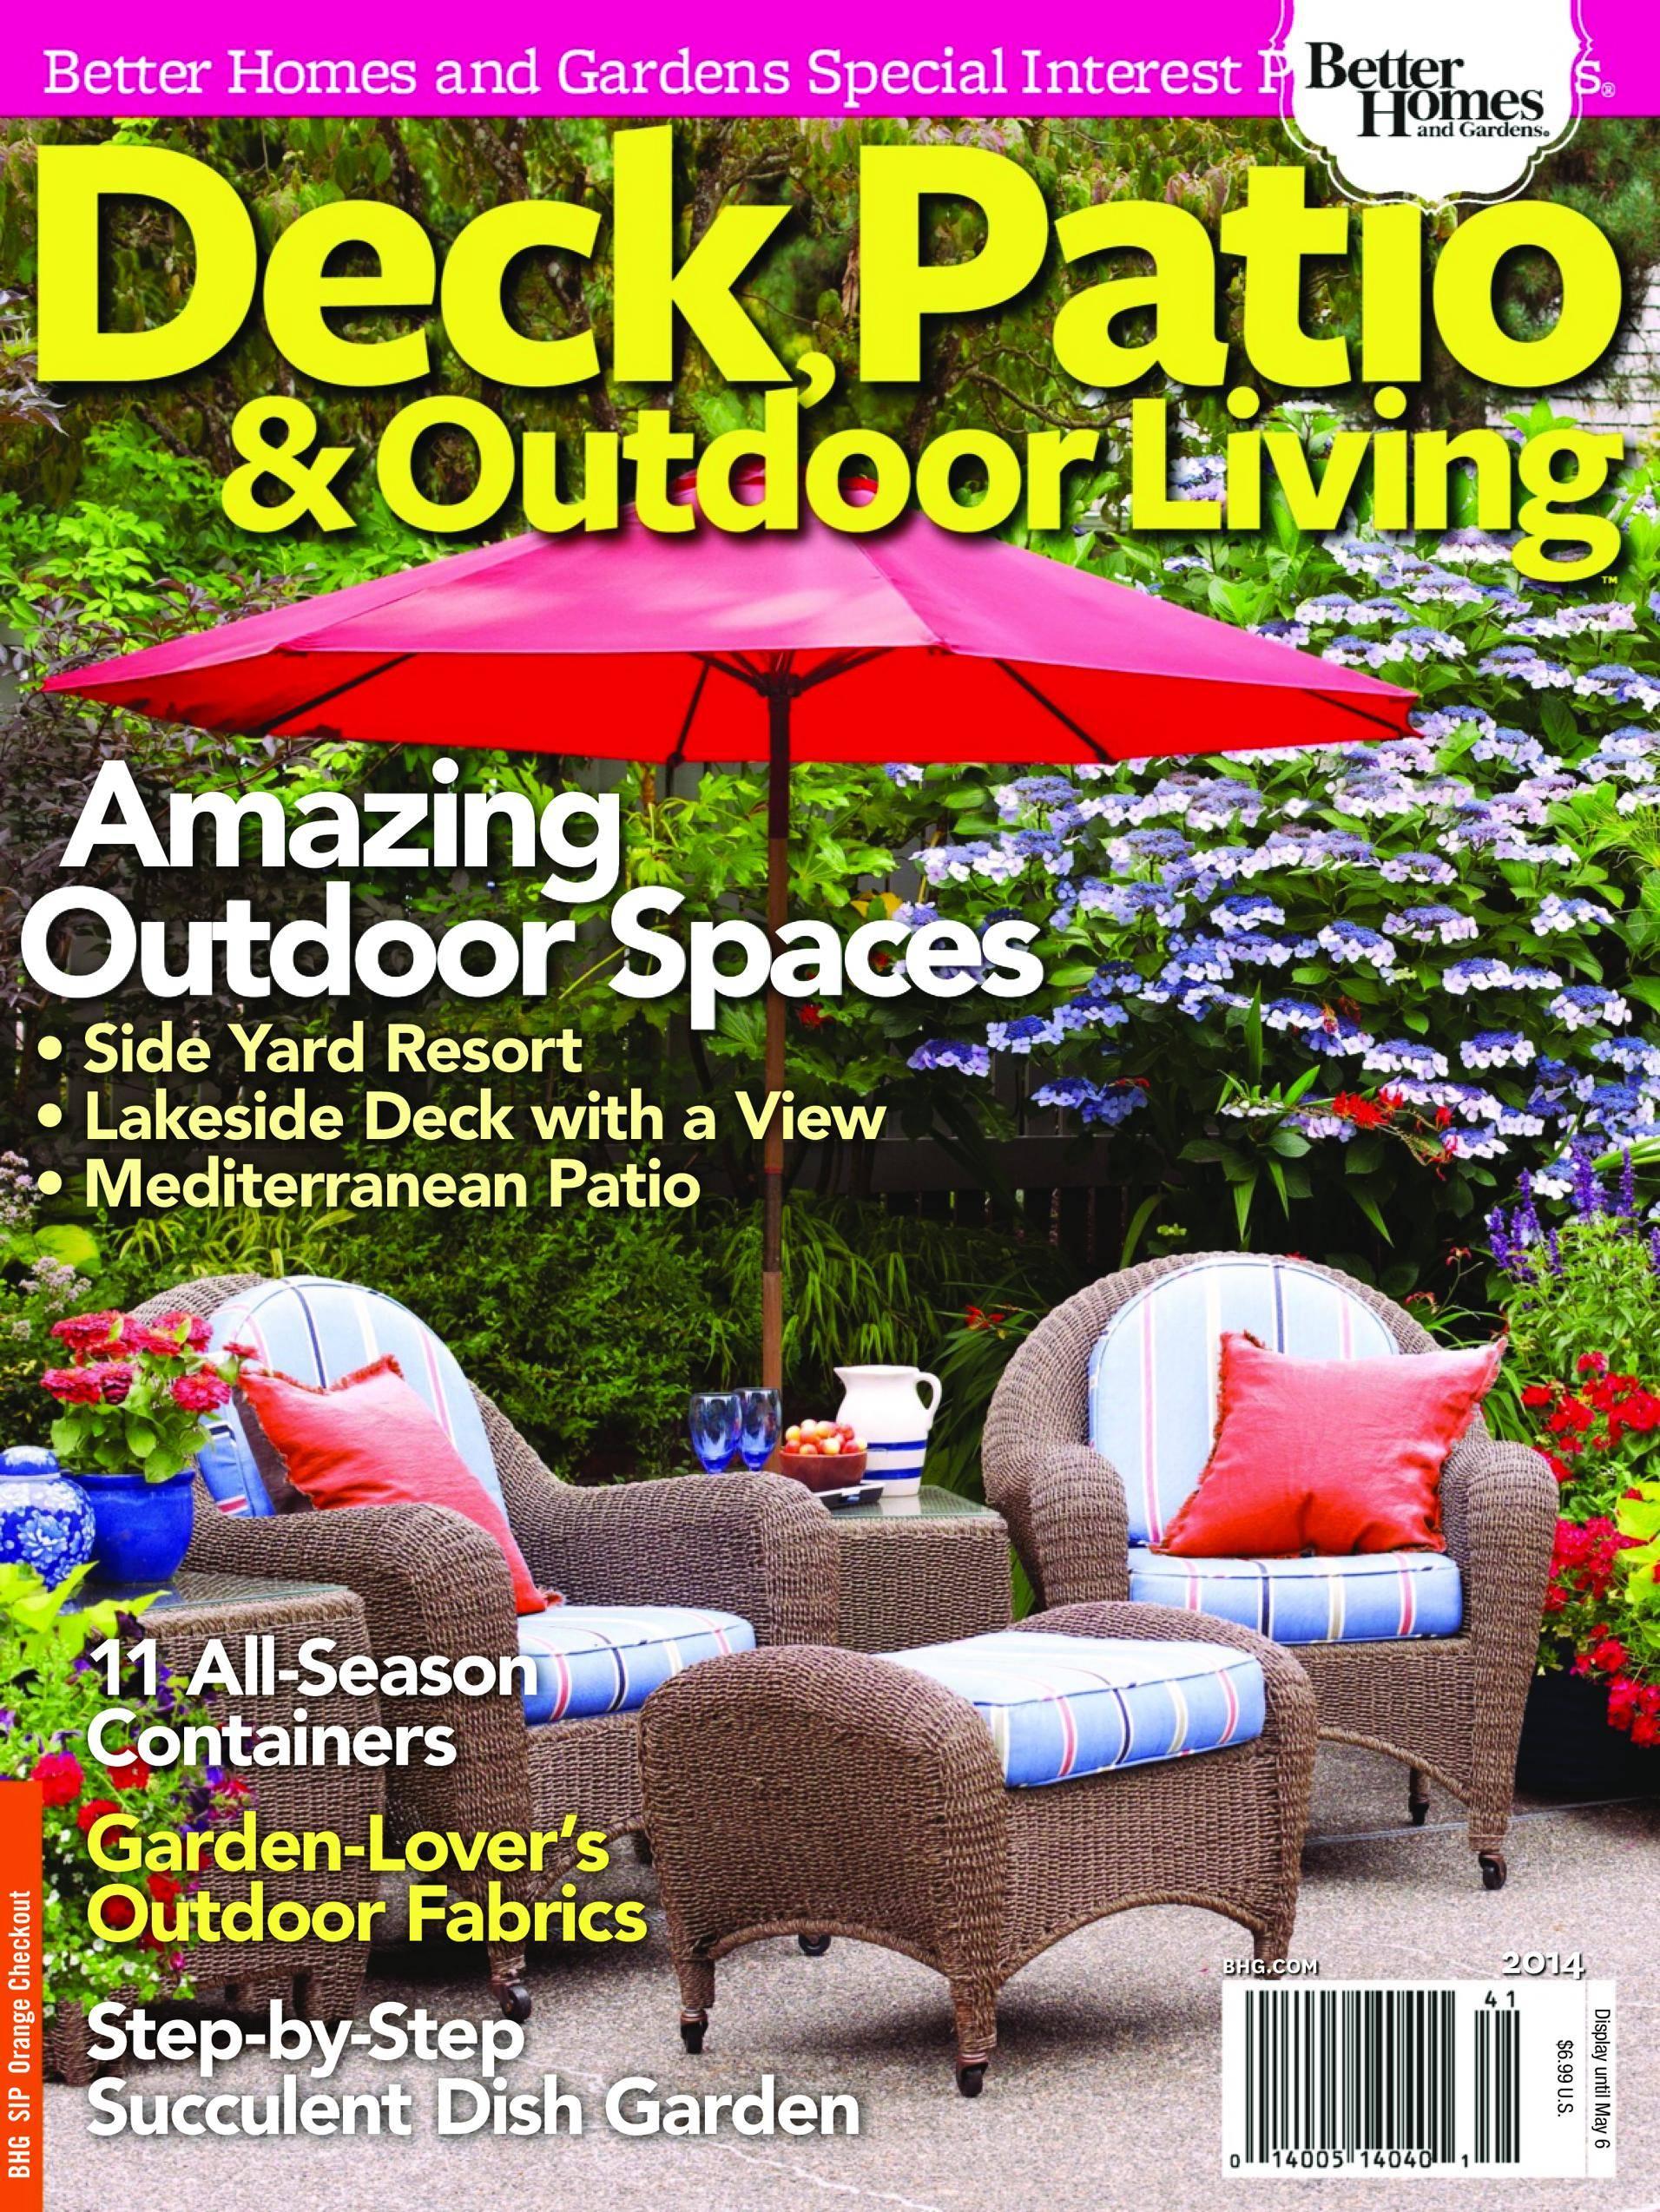 Deck, Patio & Outdoor Living - April 01, 2014